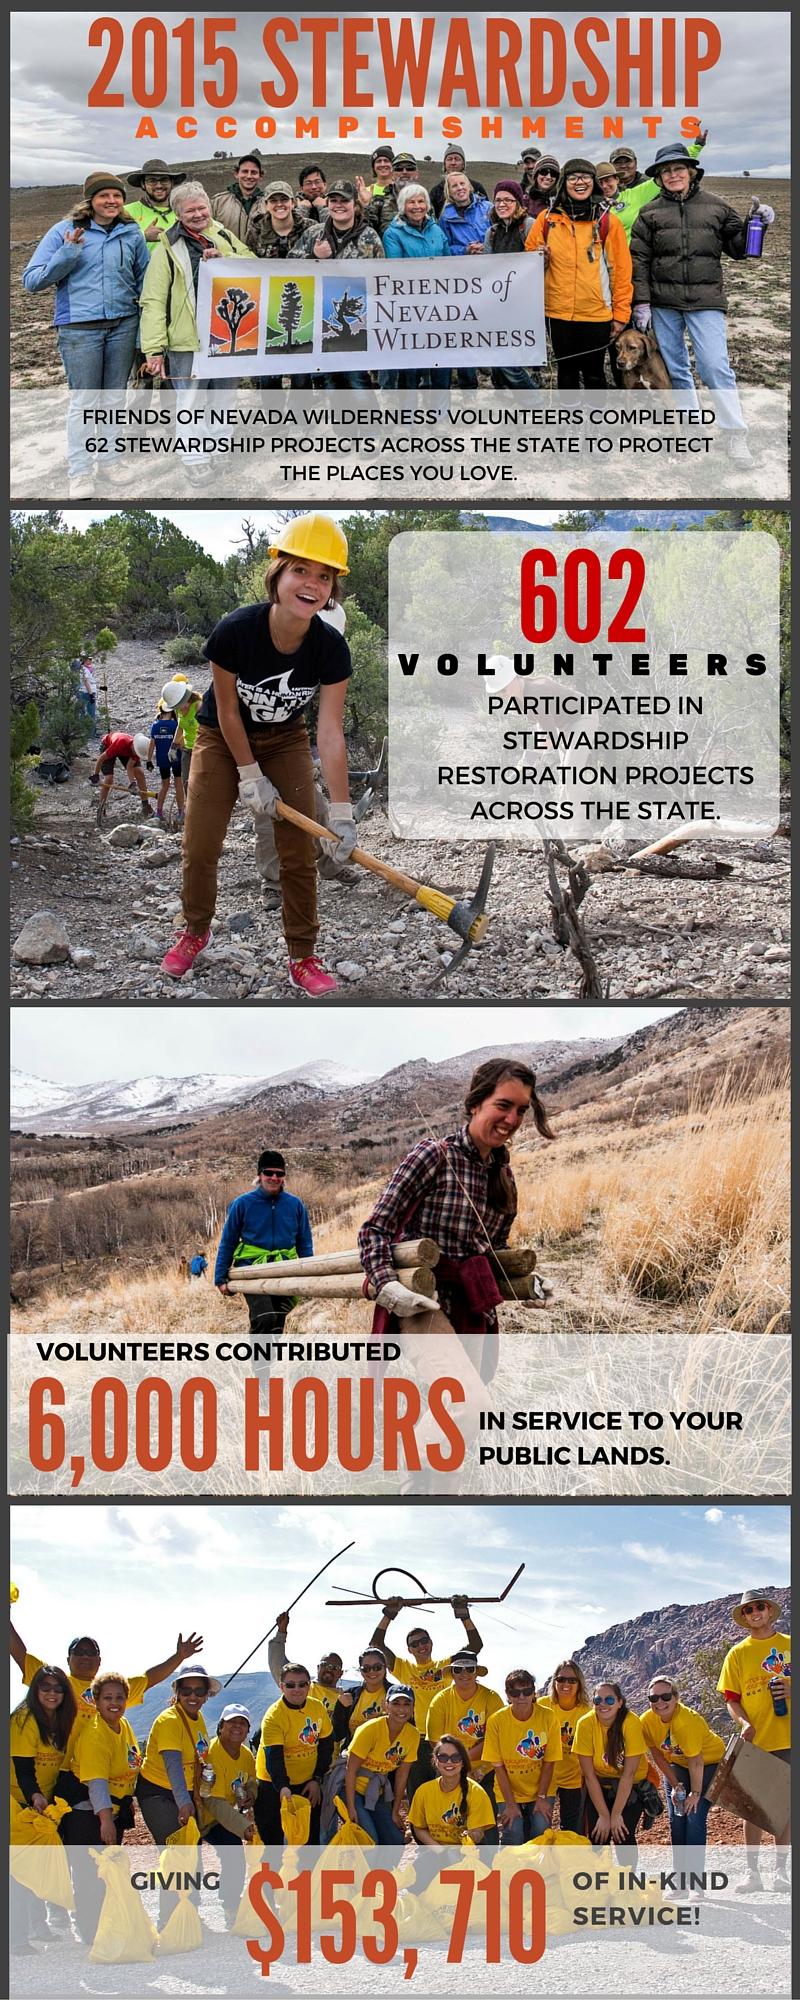 2015_Stewardship_Accomplishments.jpg